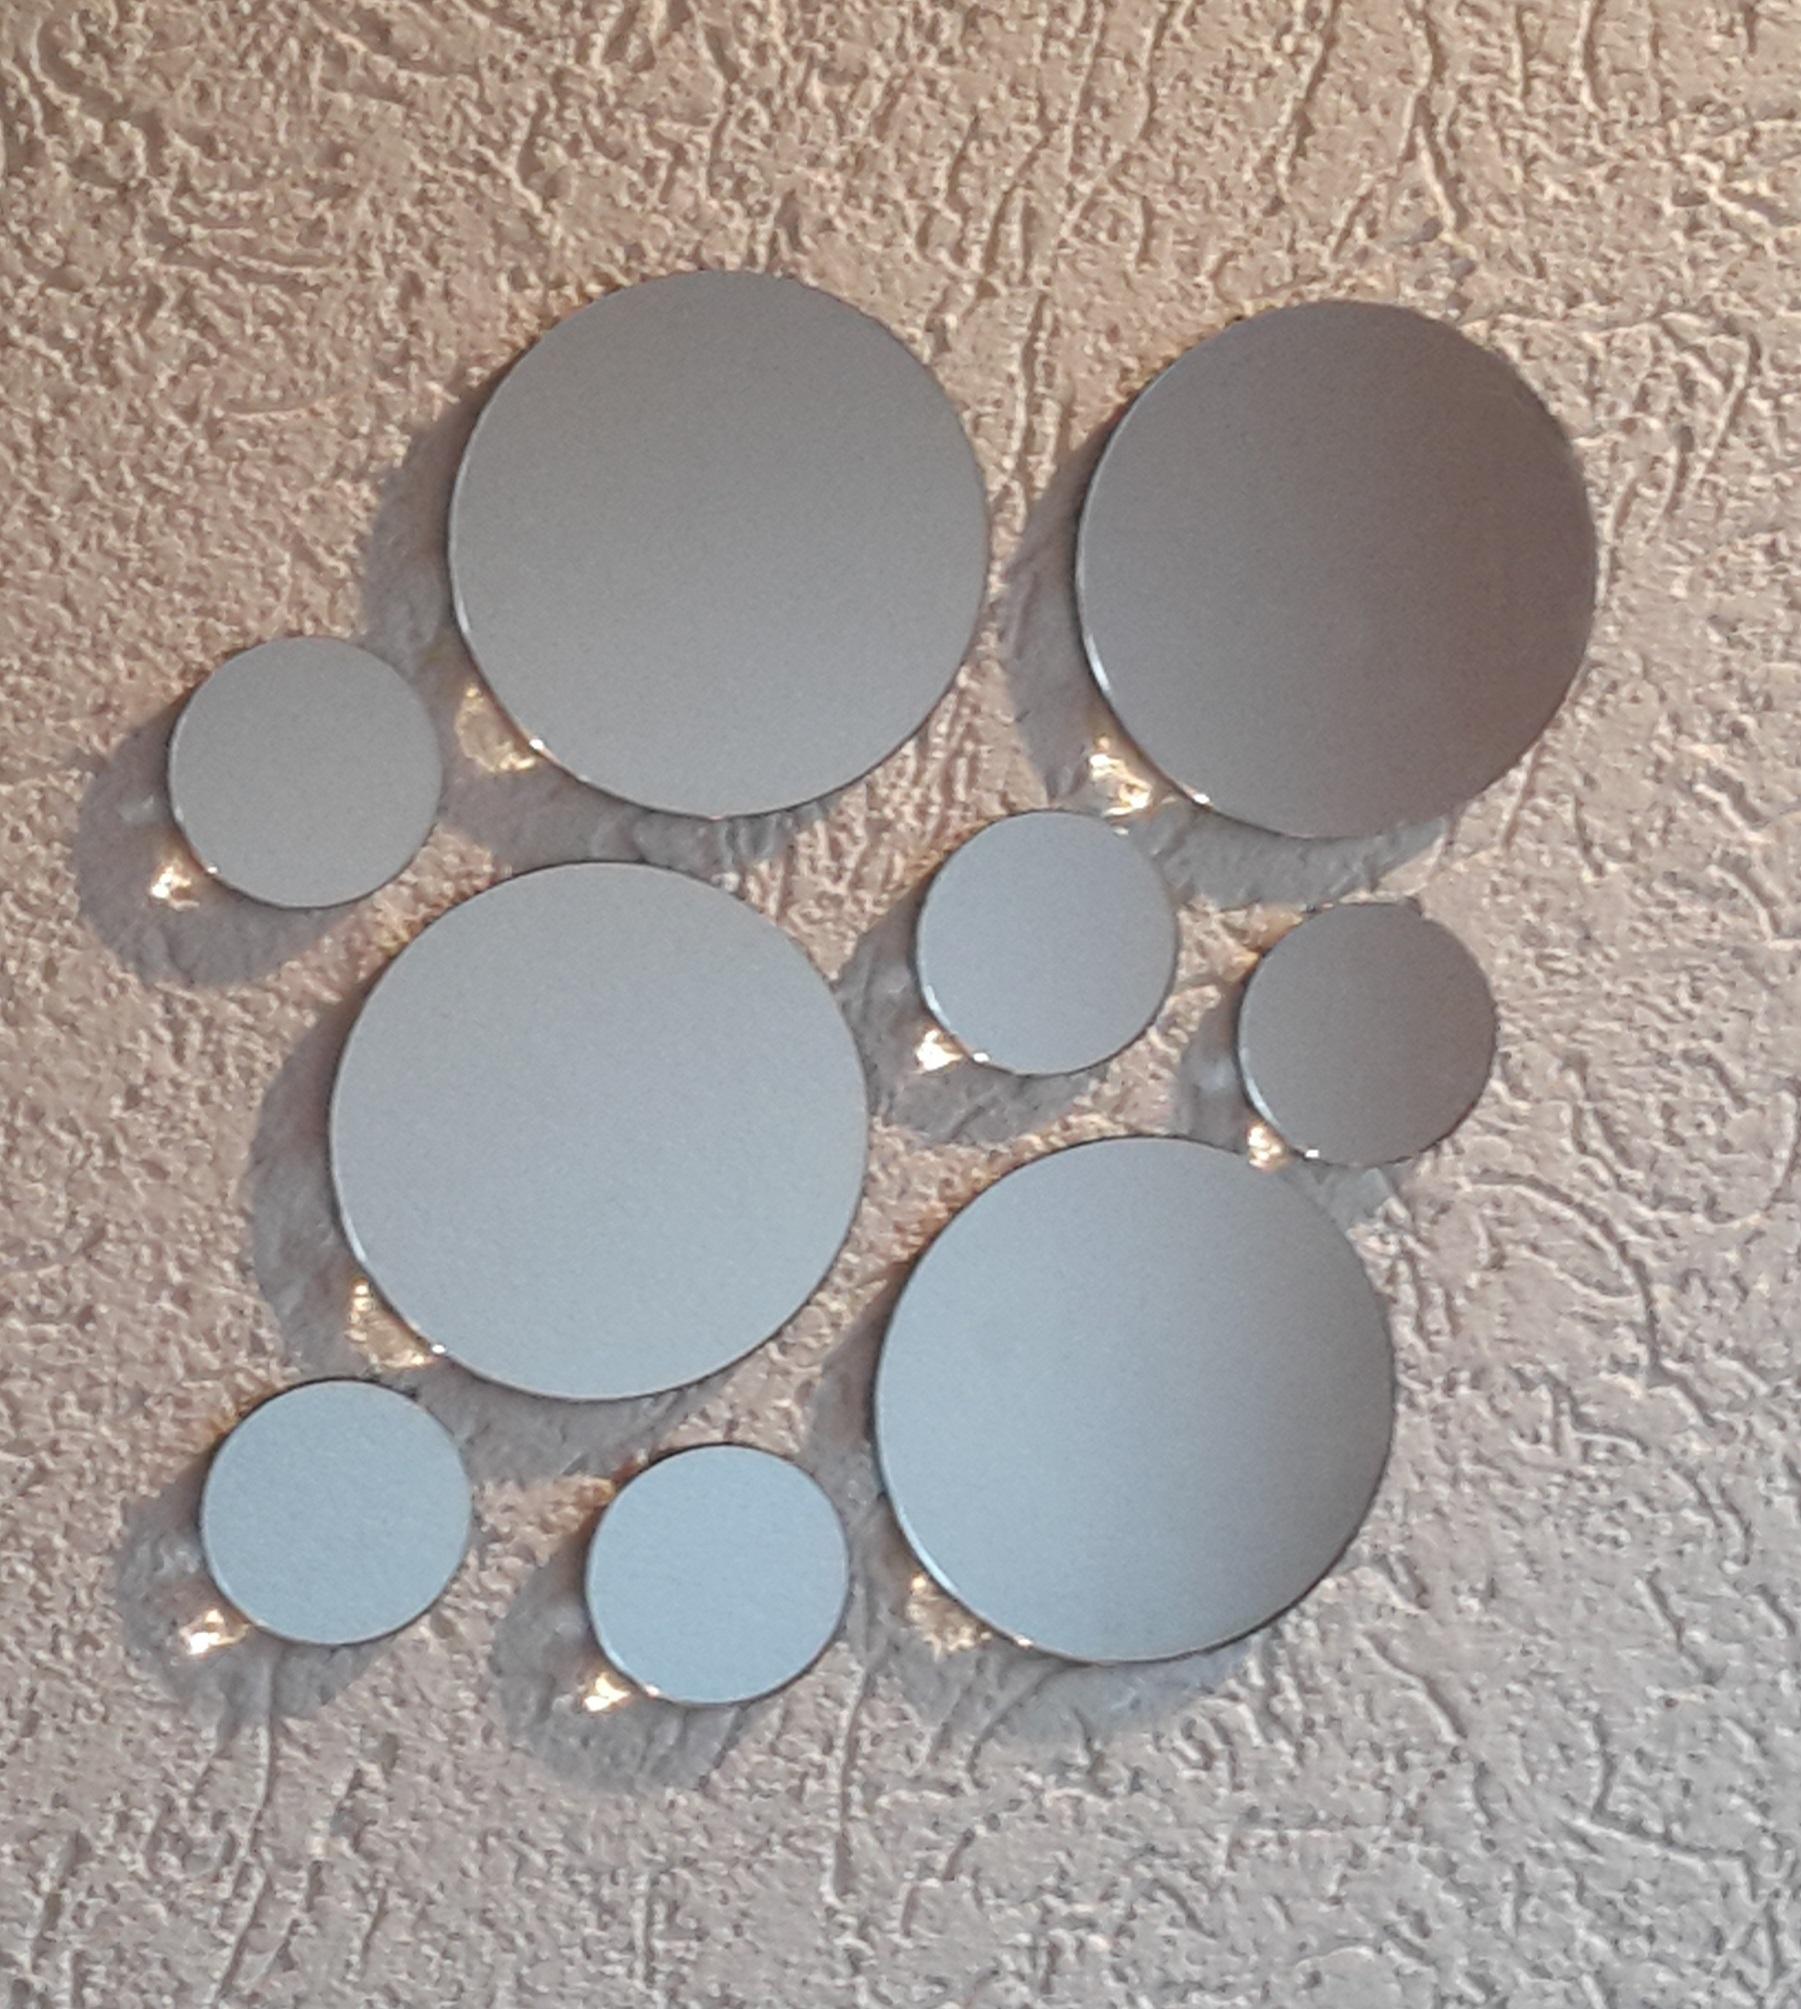 Spiegelset aus Acrylglas (Variante 1)